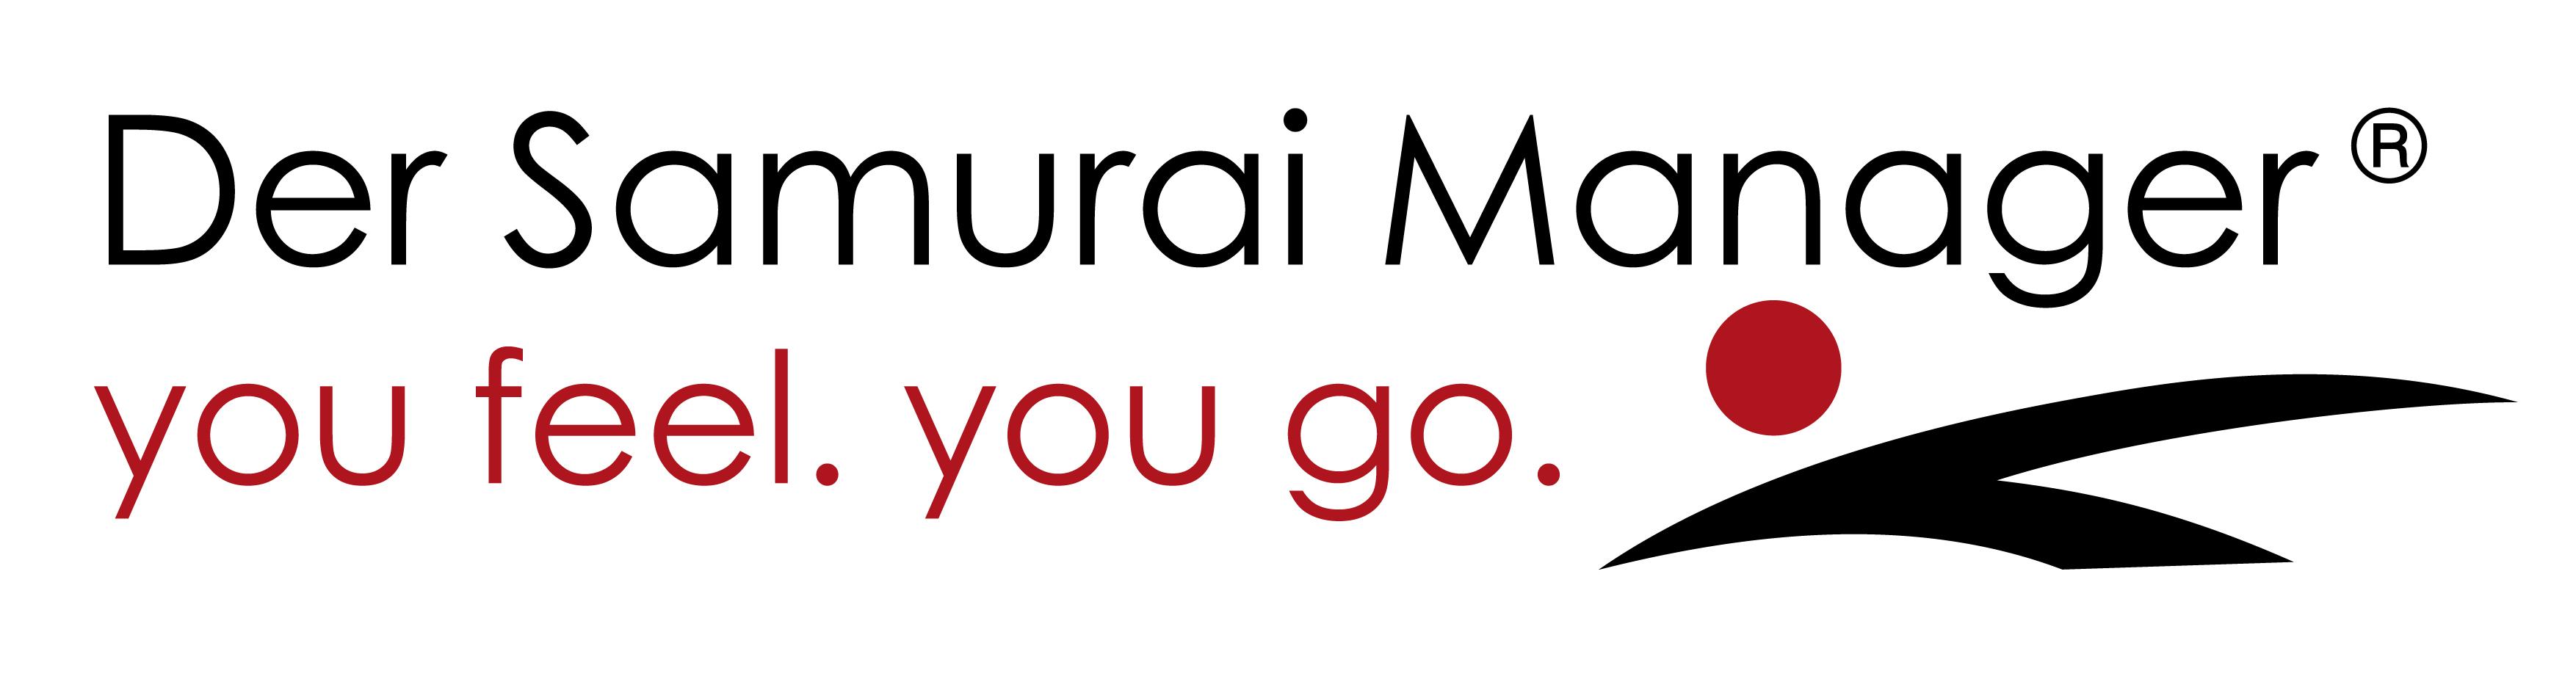 Der_Samurai_Manager_Logo